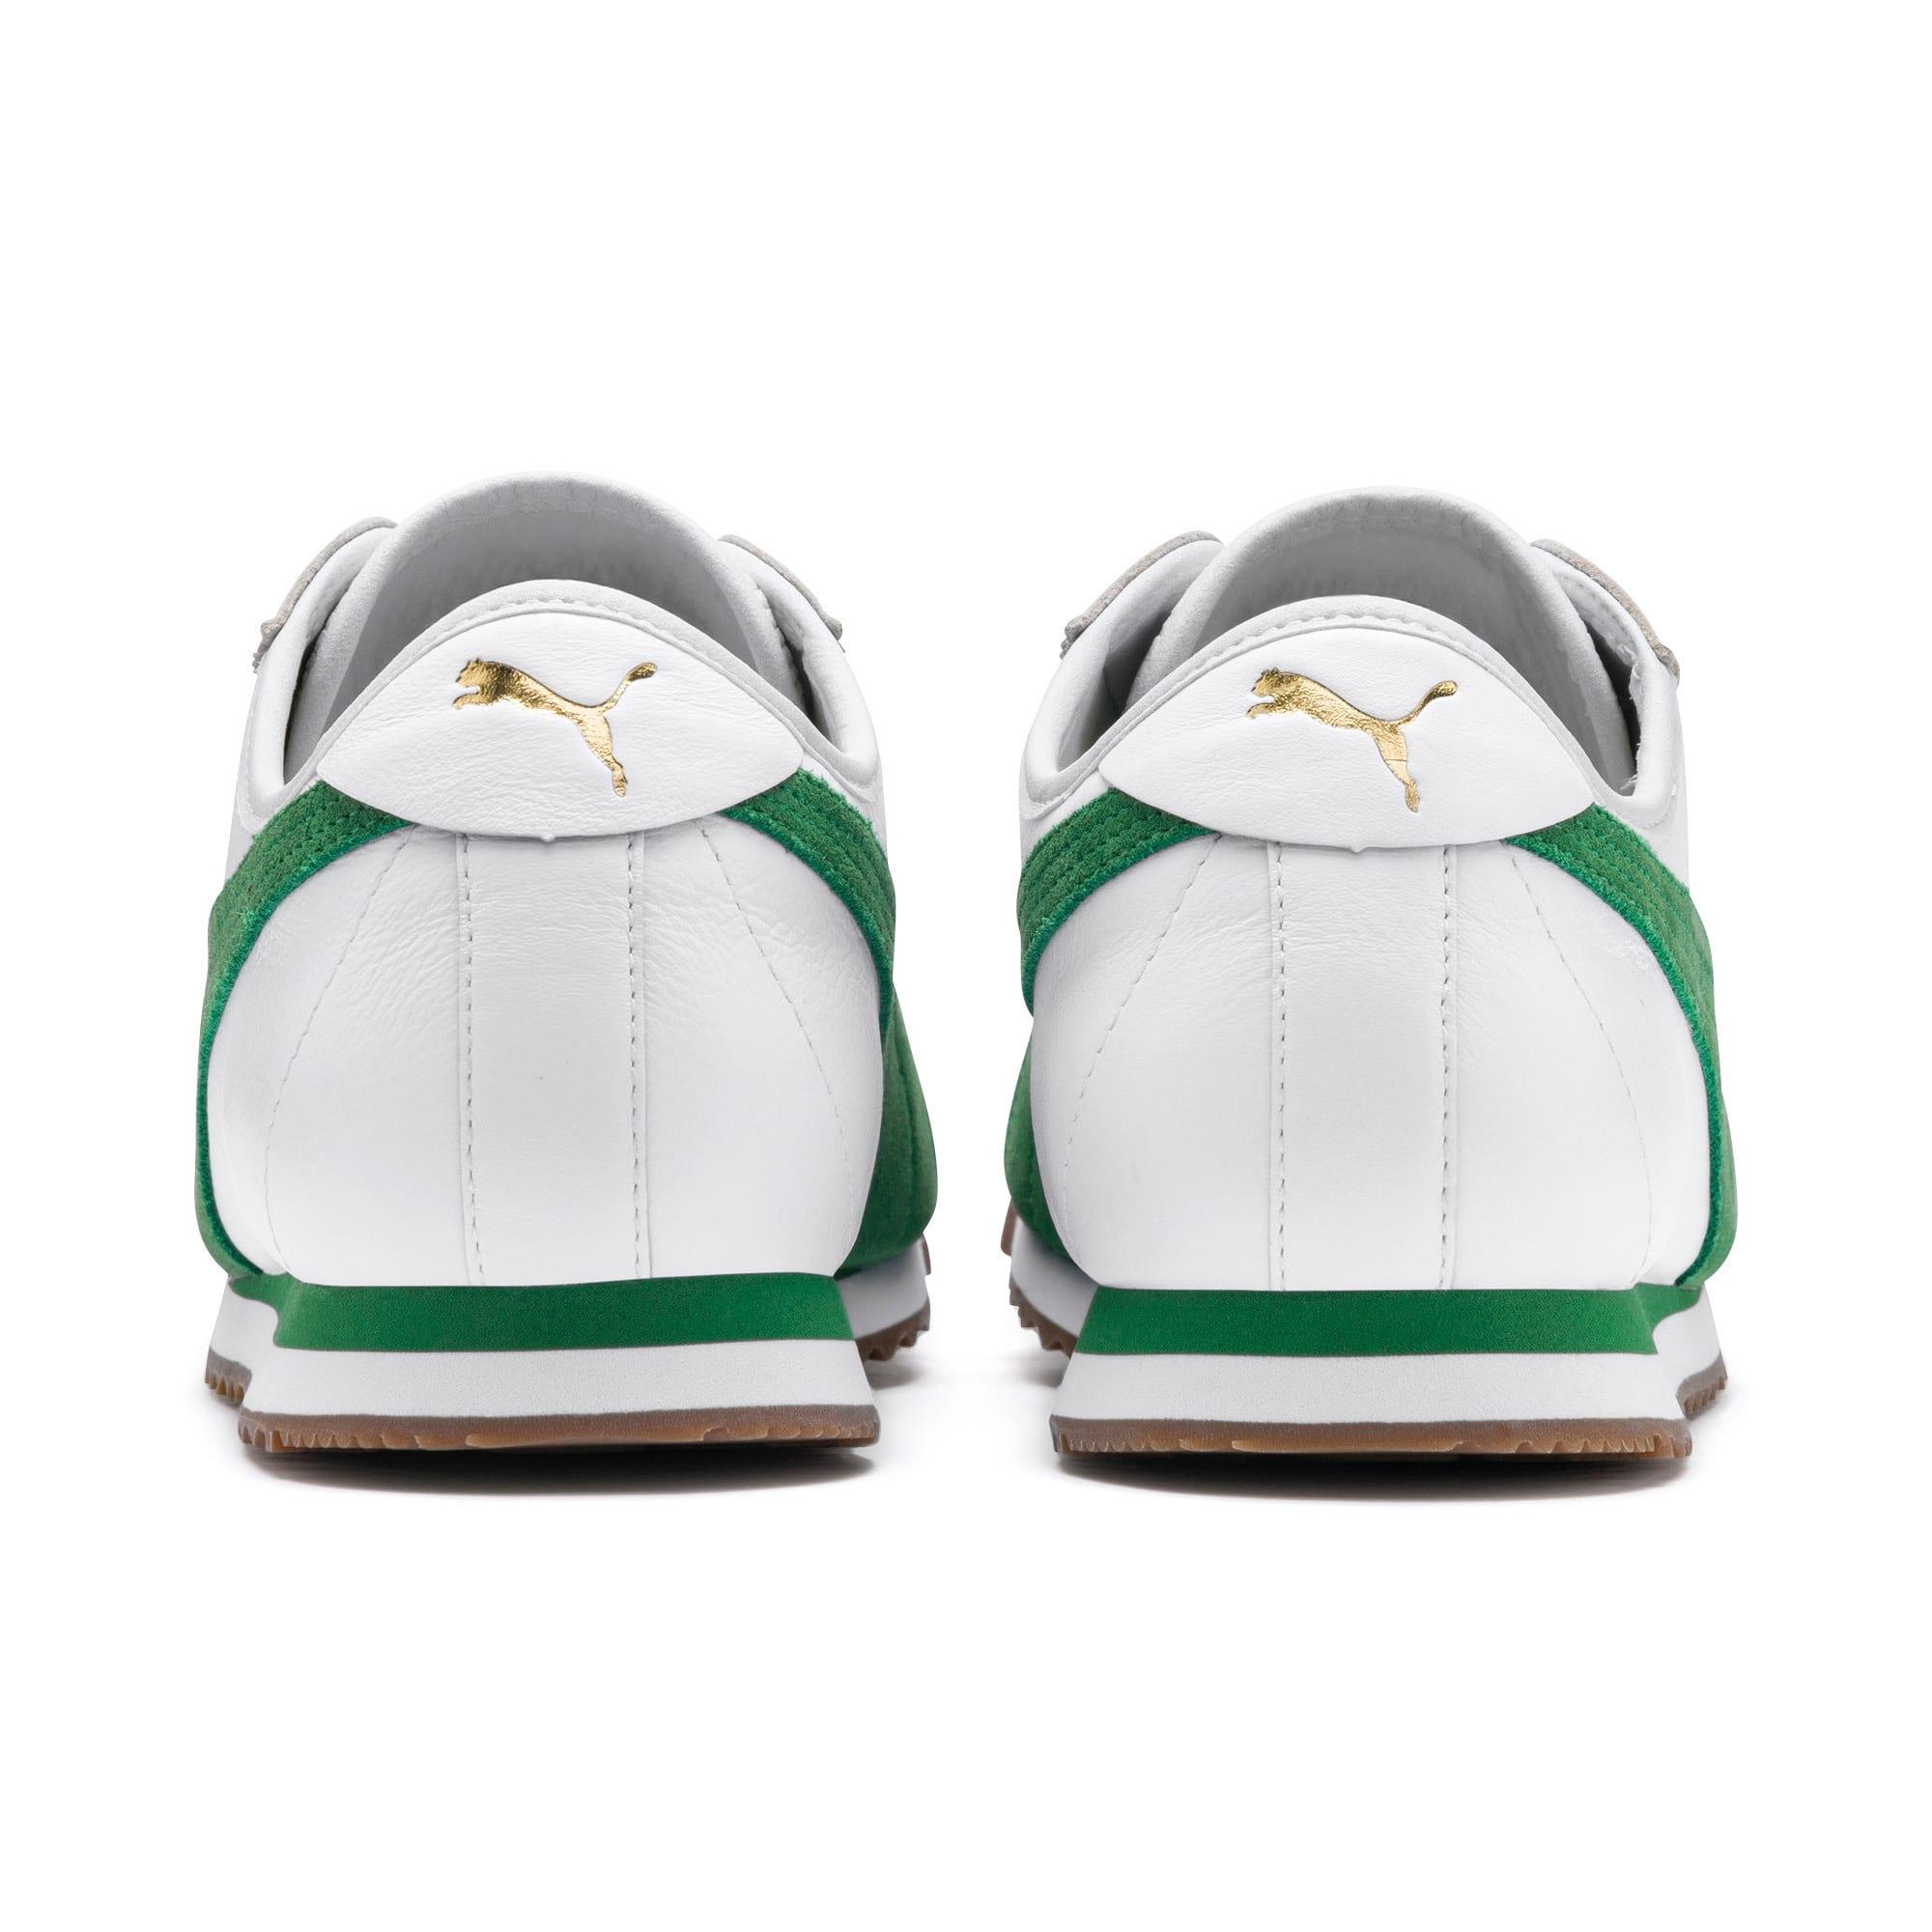 Thumbnail 4 of ローマ '68 OG スニーカー, Puma White-Amazon Green, medium-JPN